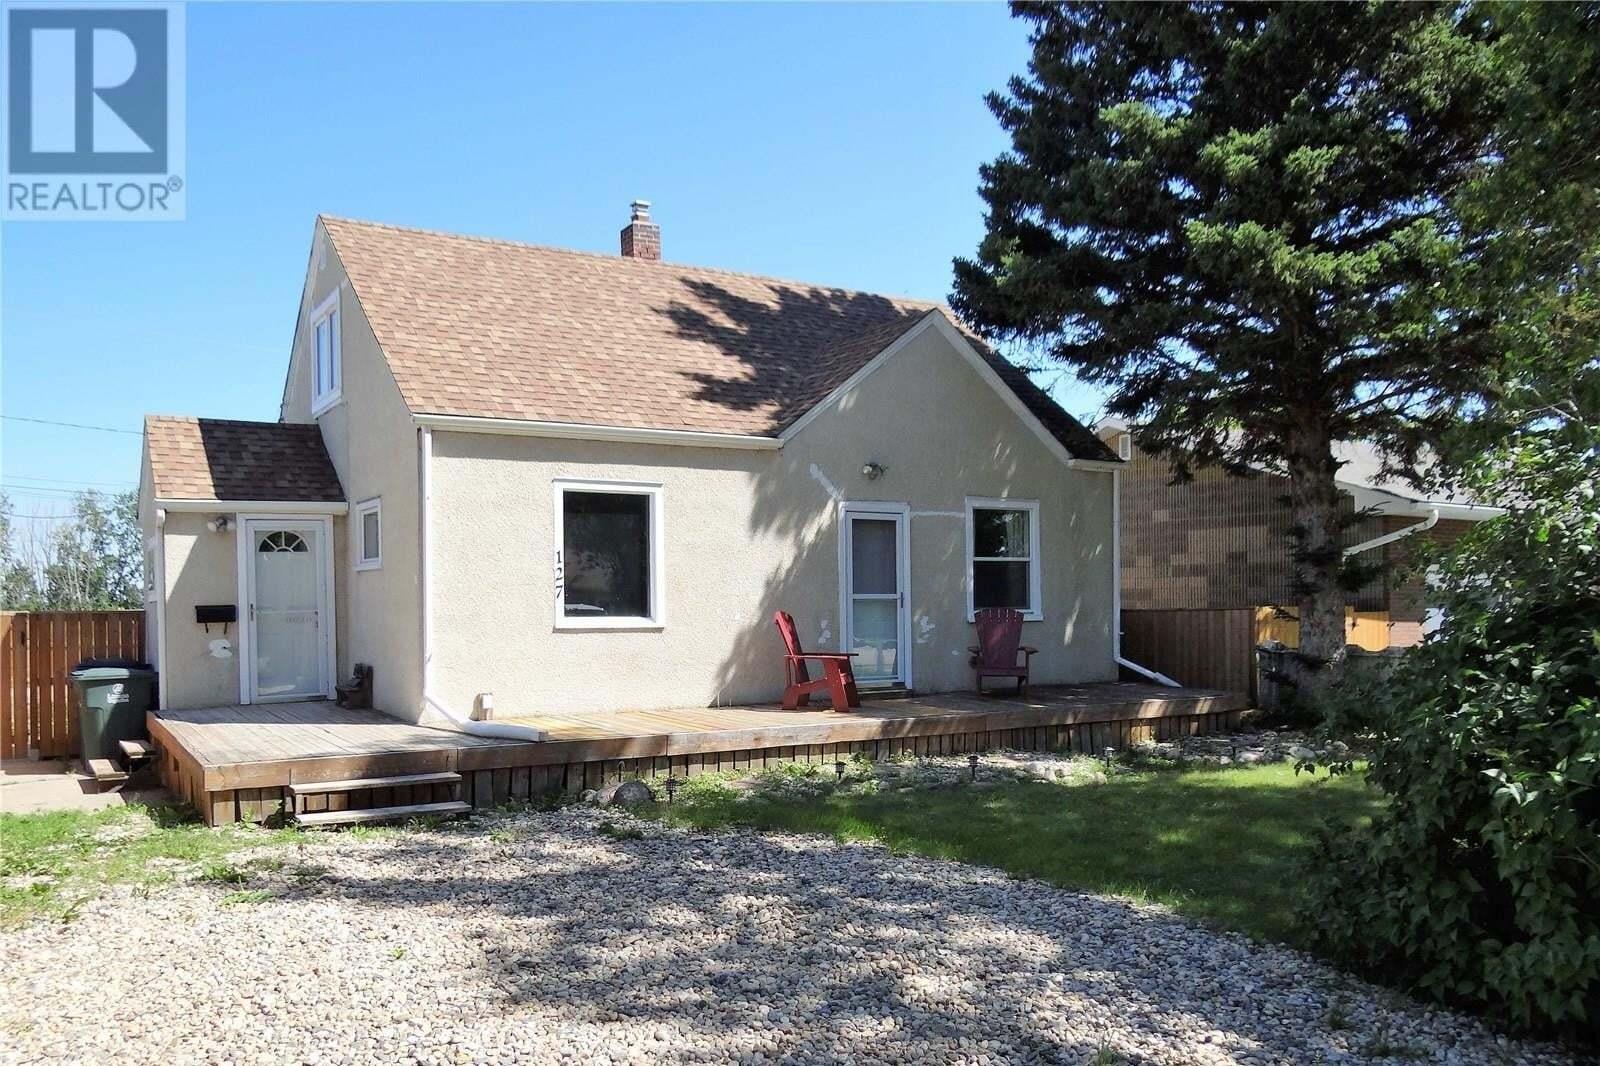 House for sale at 127 Main St E Langham Saskatchewan - MLS: SK817600